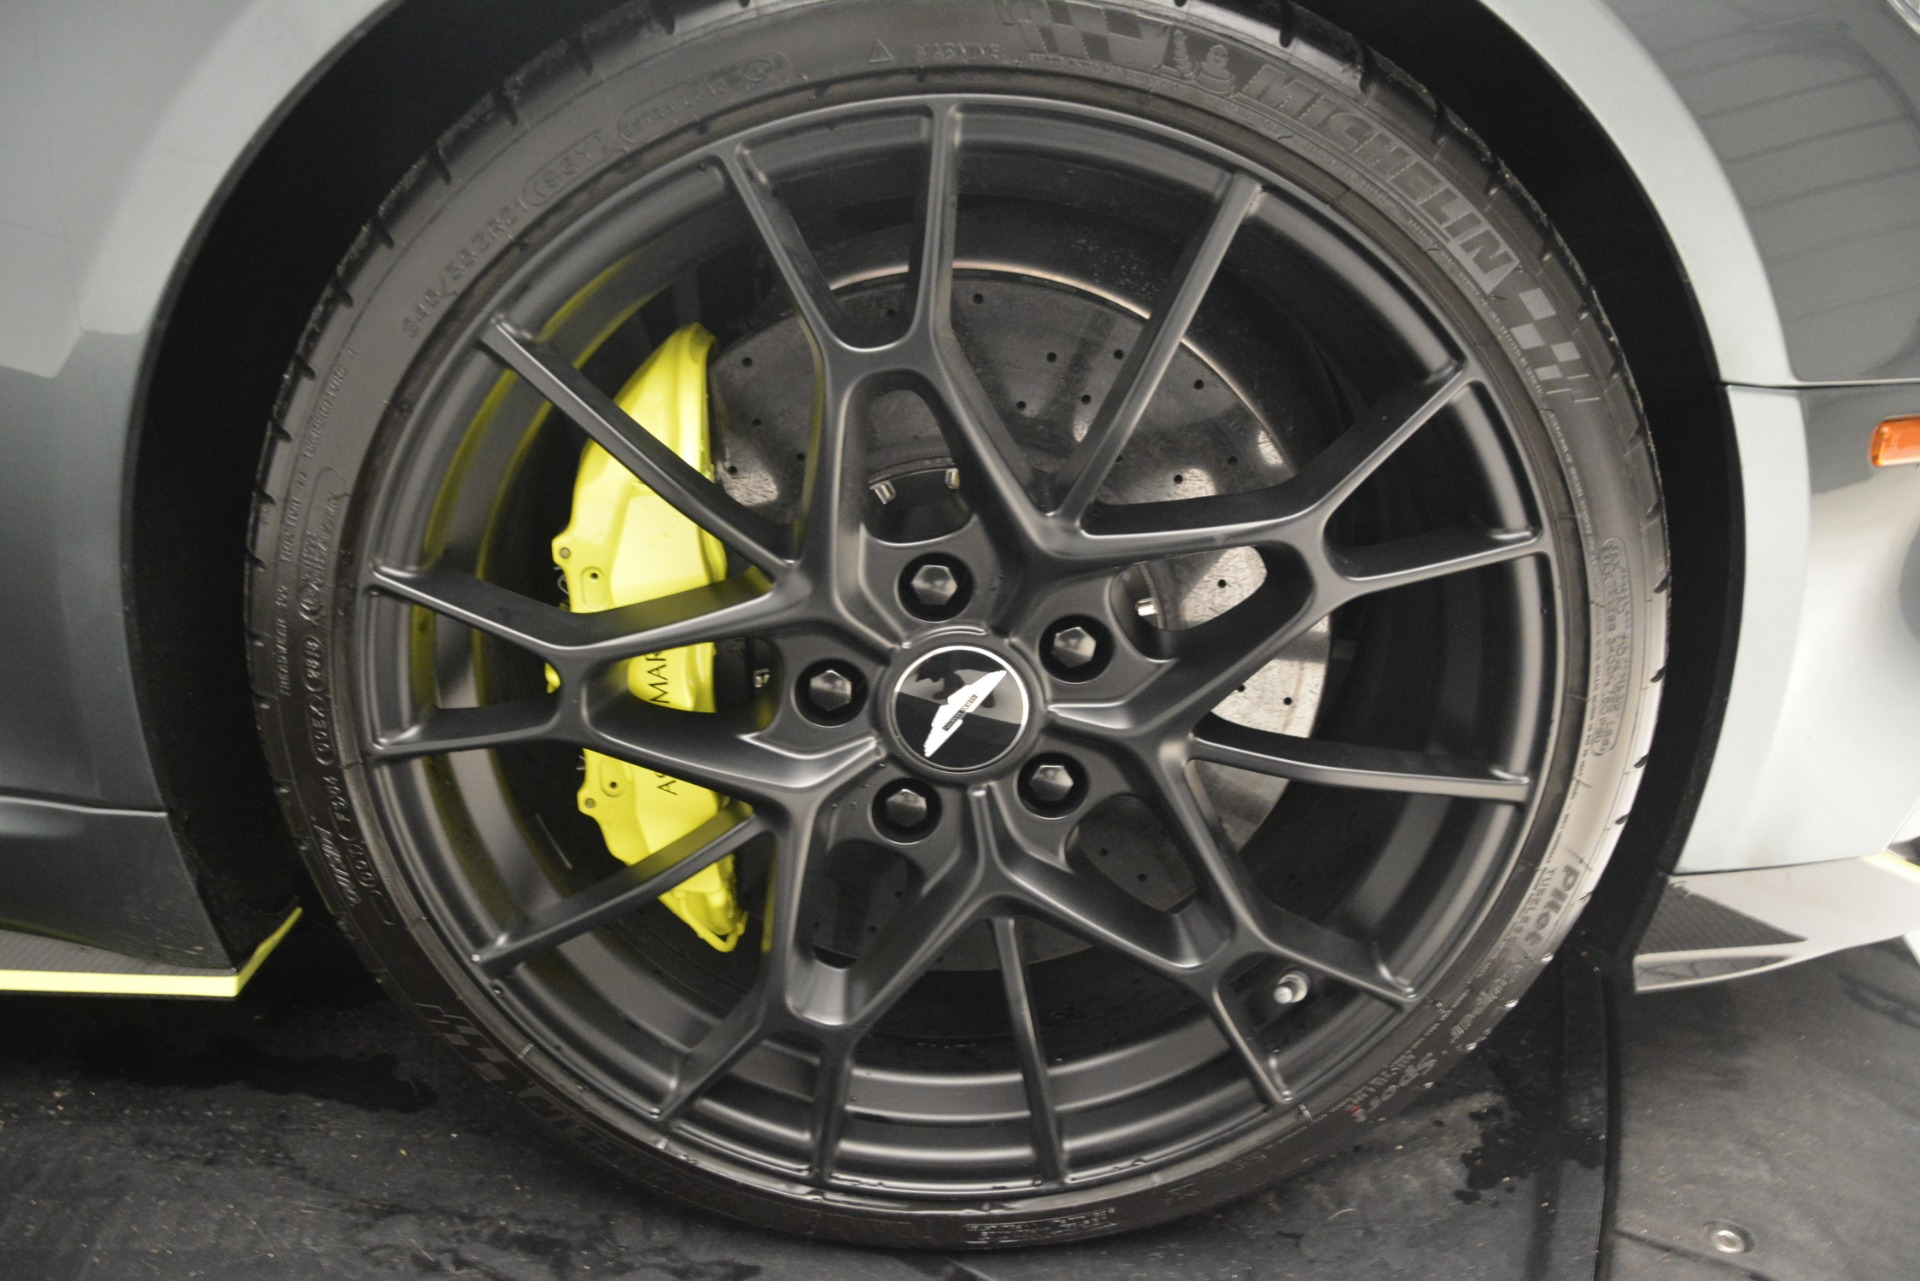 New-2019-Aston-Martin-Rapide-V12-AMR